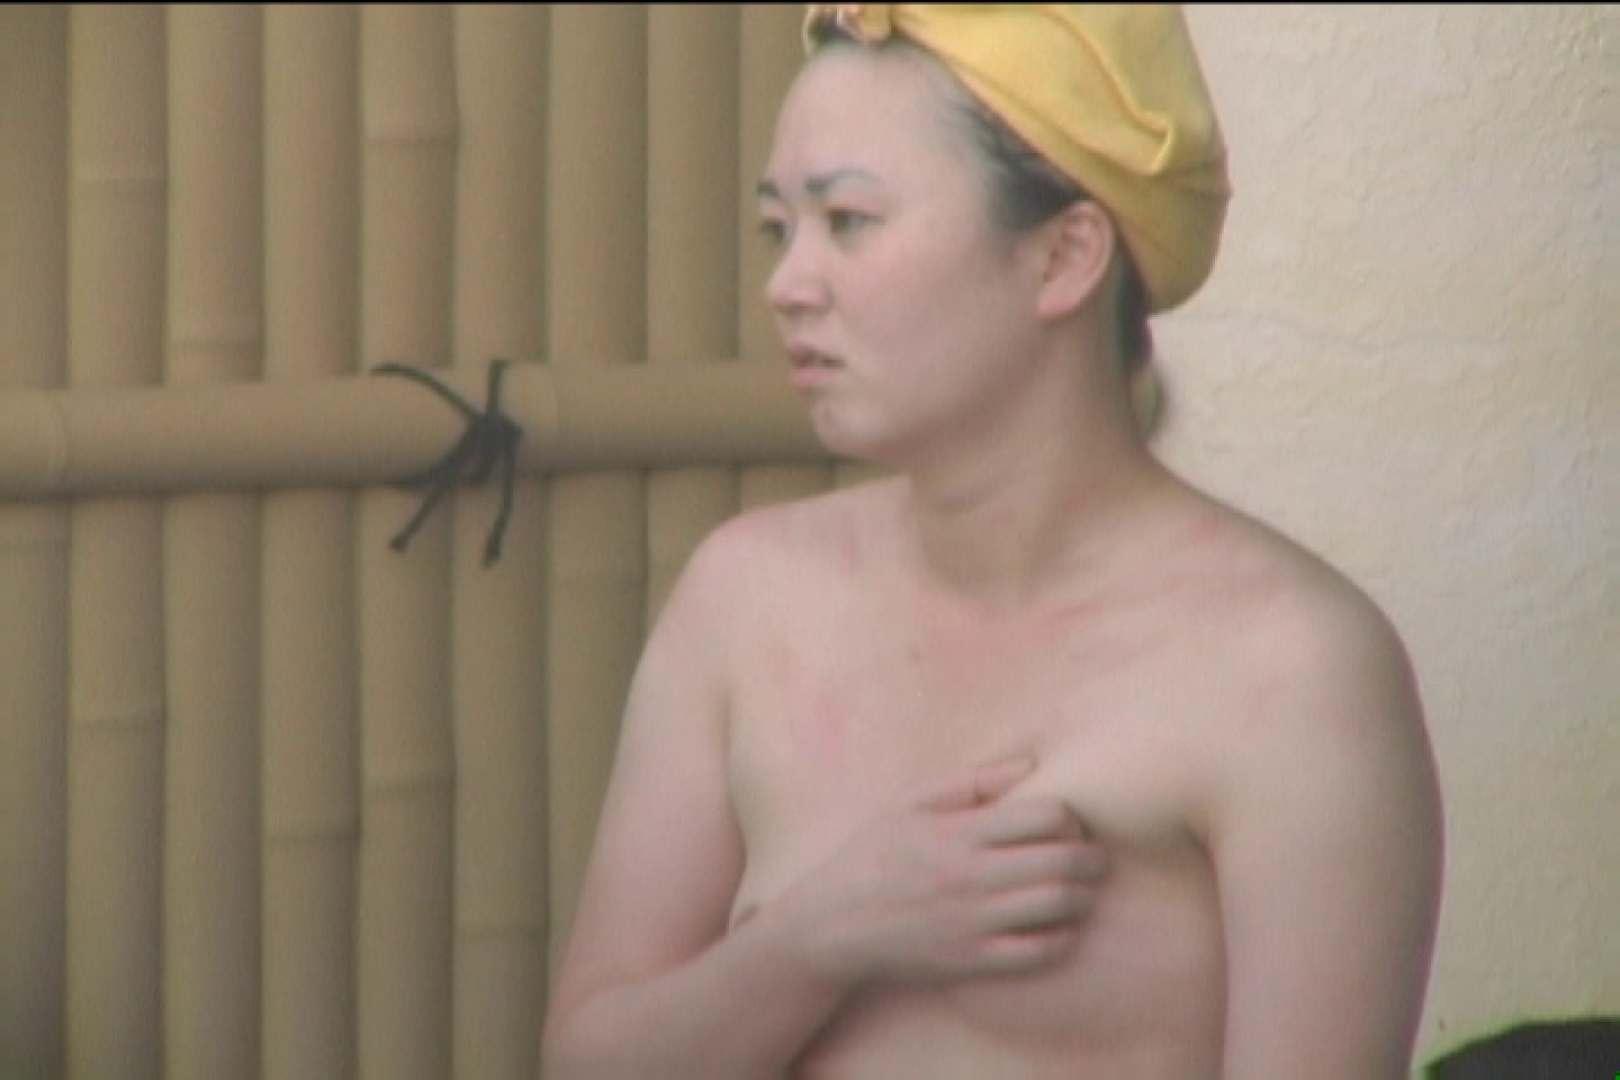 高画質露天女風呂観察 vol.018 女風呂 えろ無修正画像 104pic 97